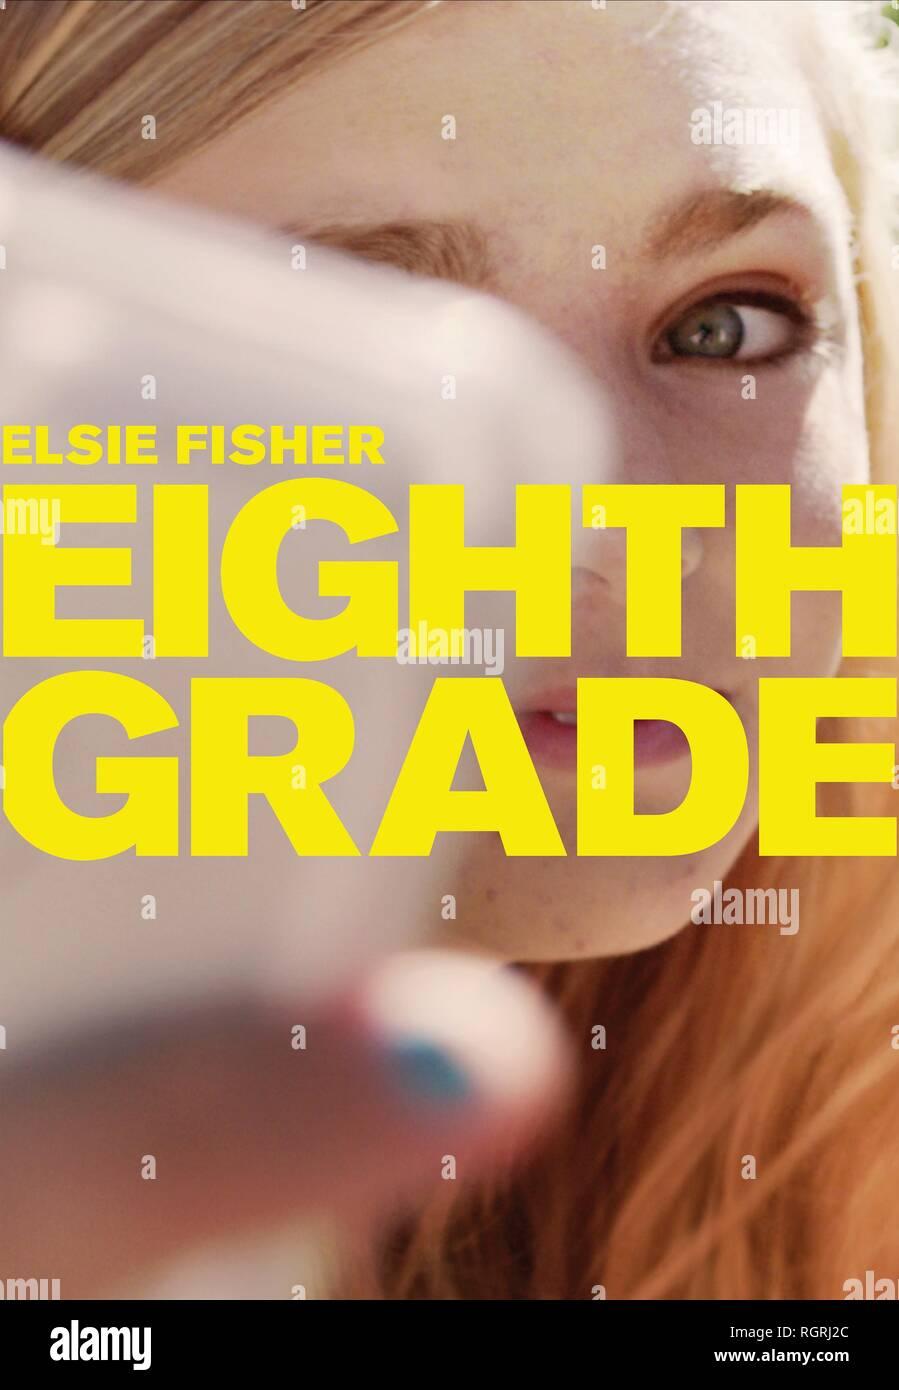 MOVIE POSTER EIGHTH GRADE (2018) - Stock Image